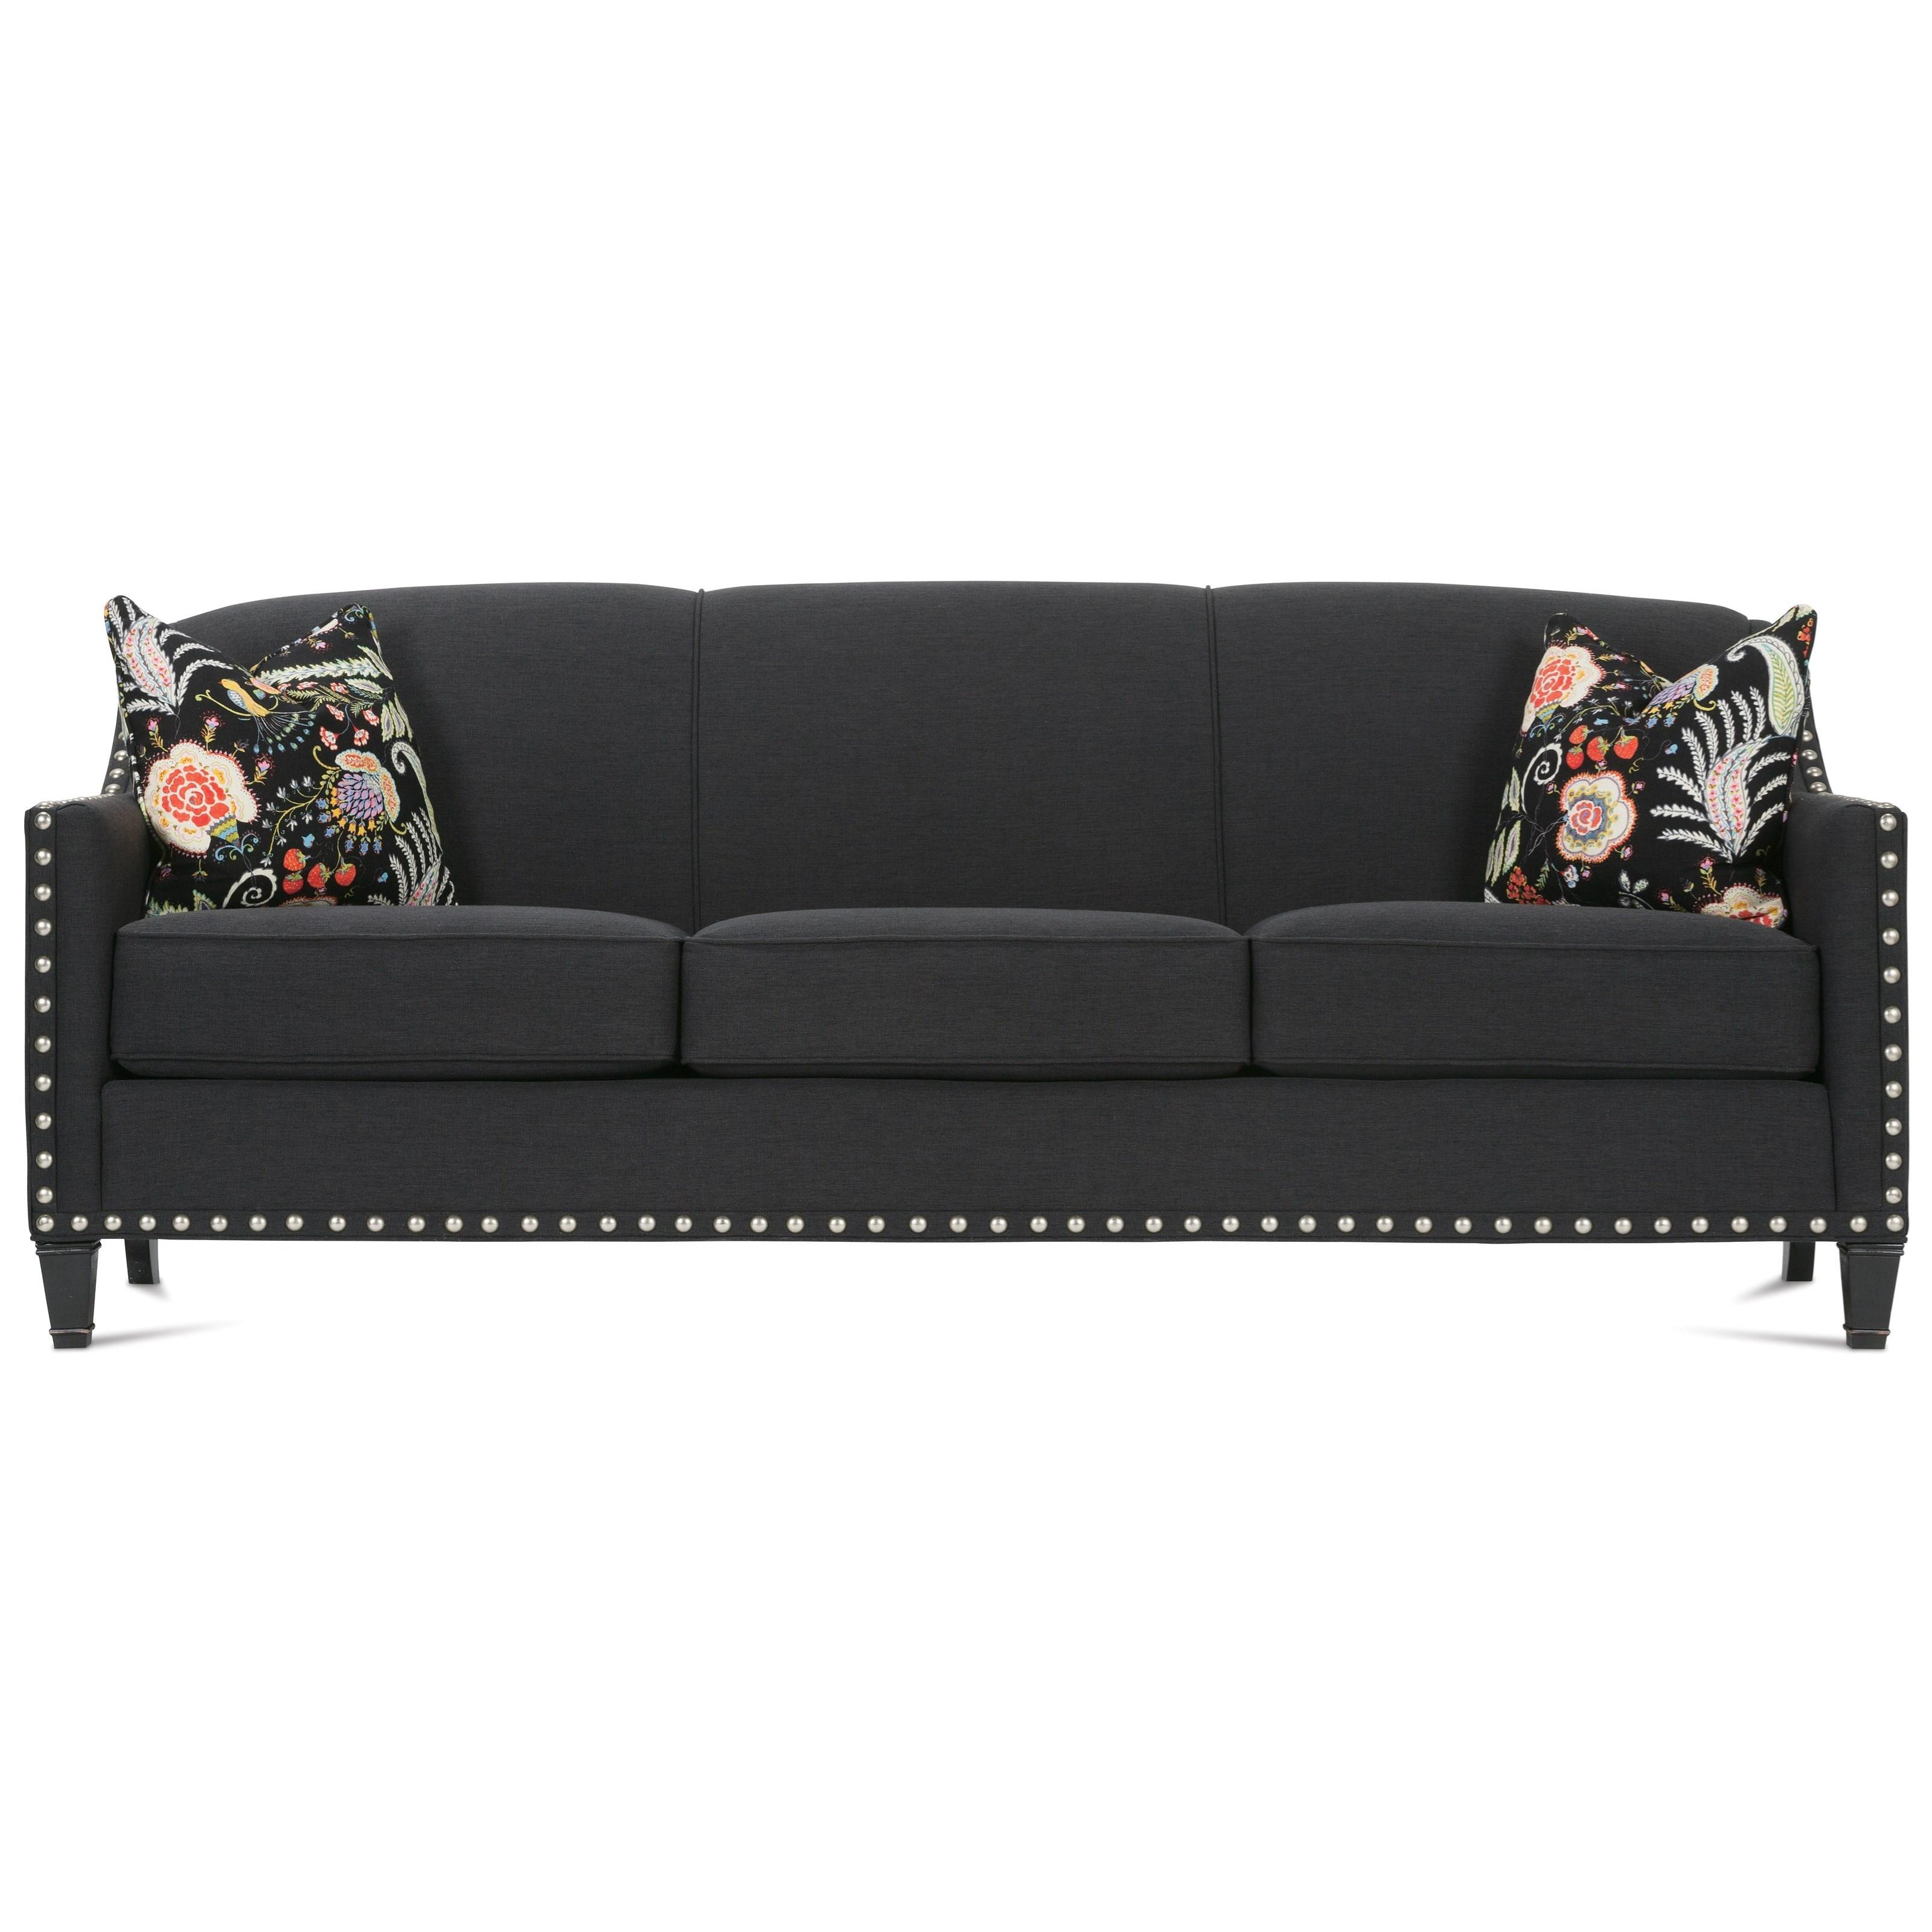 Merveilleux Rowe RockfordTraditional Upholstered Sofa ...